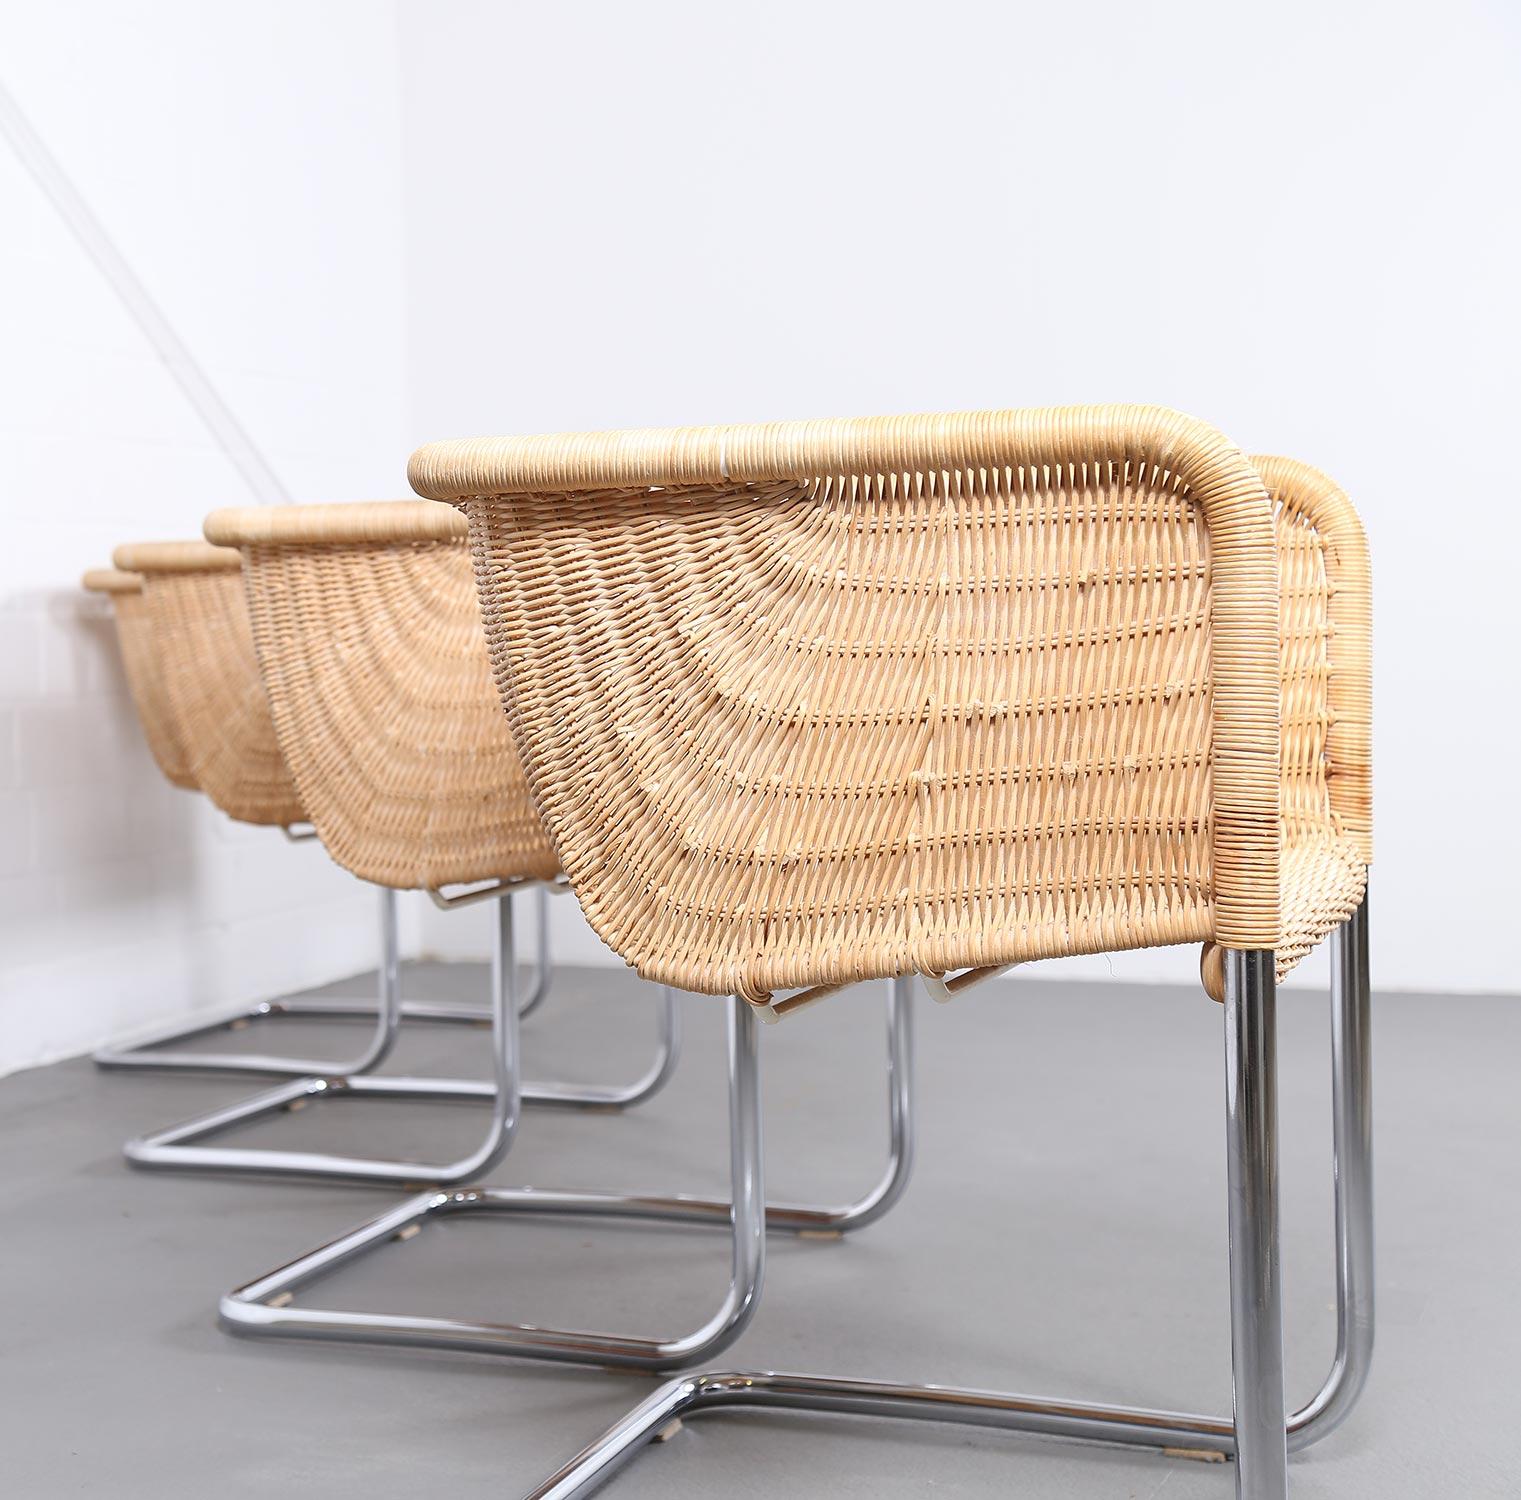 bauhaus chairs d43 stahlrohr freischwinger by tecta. Black Bedroom Furniture Sets. Home Design Ideas